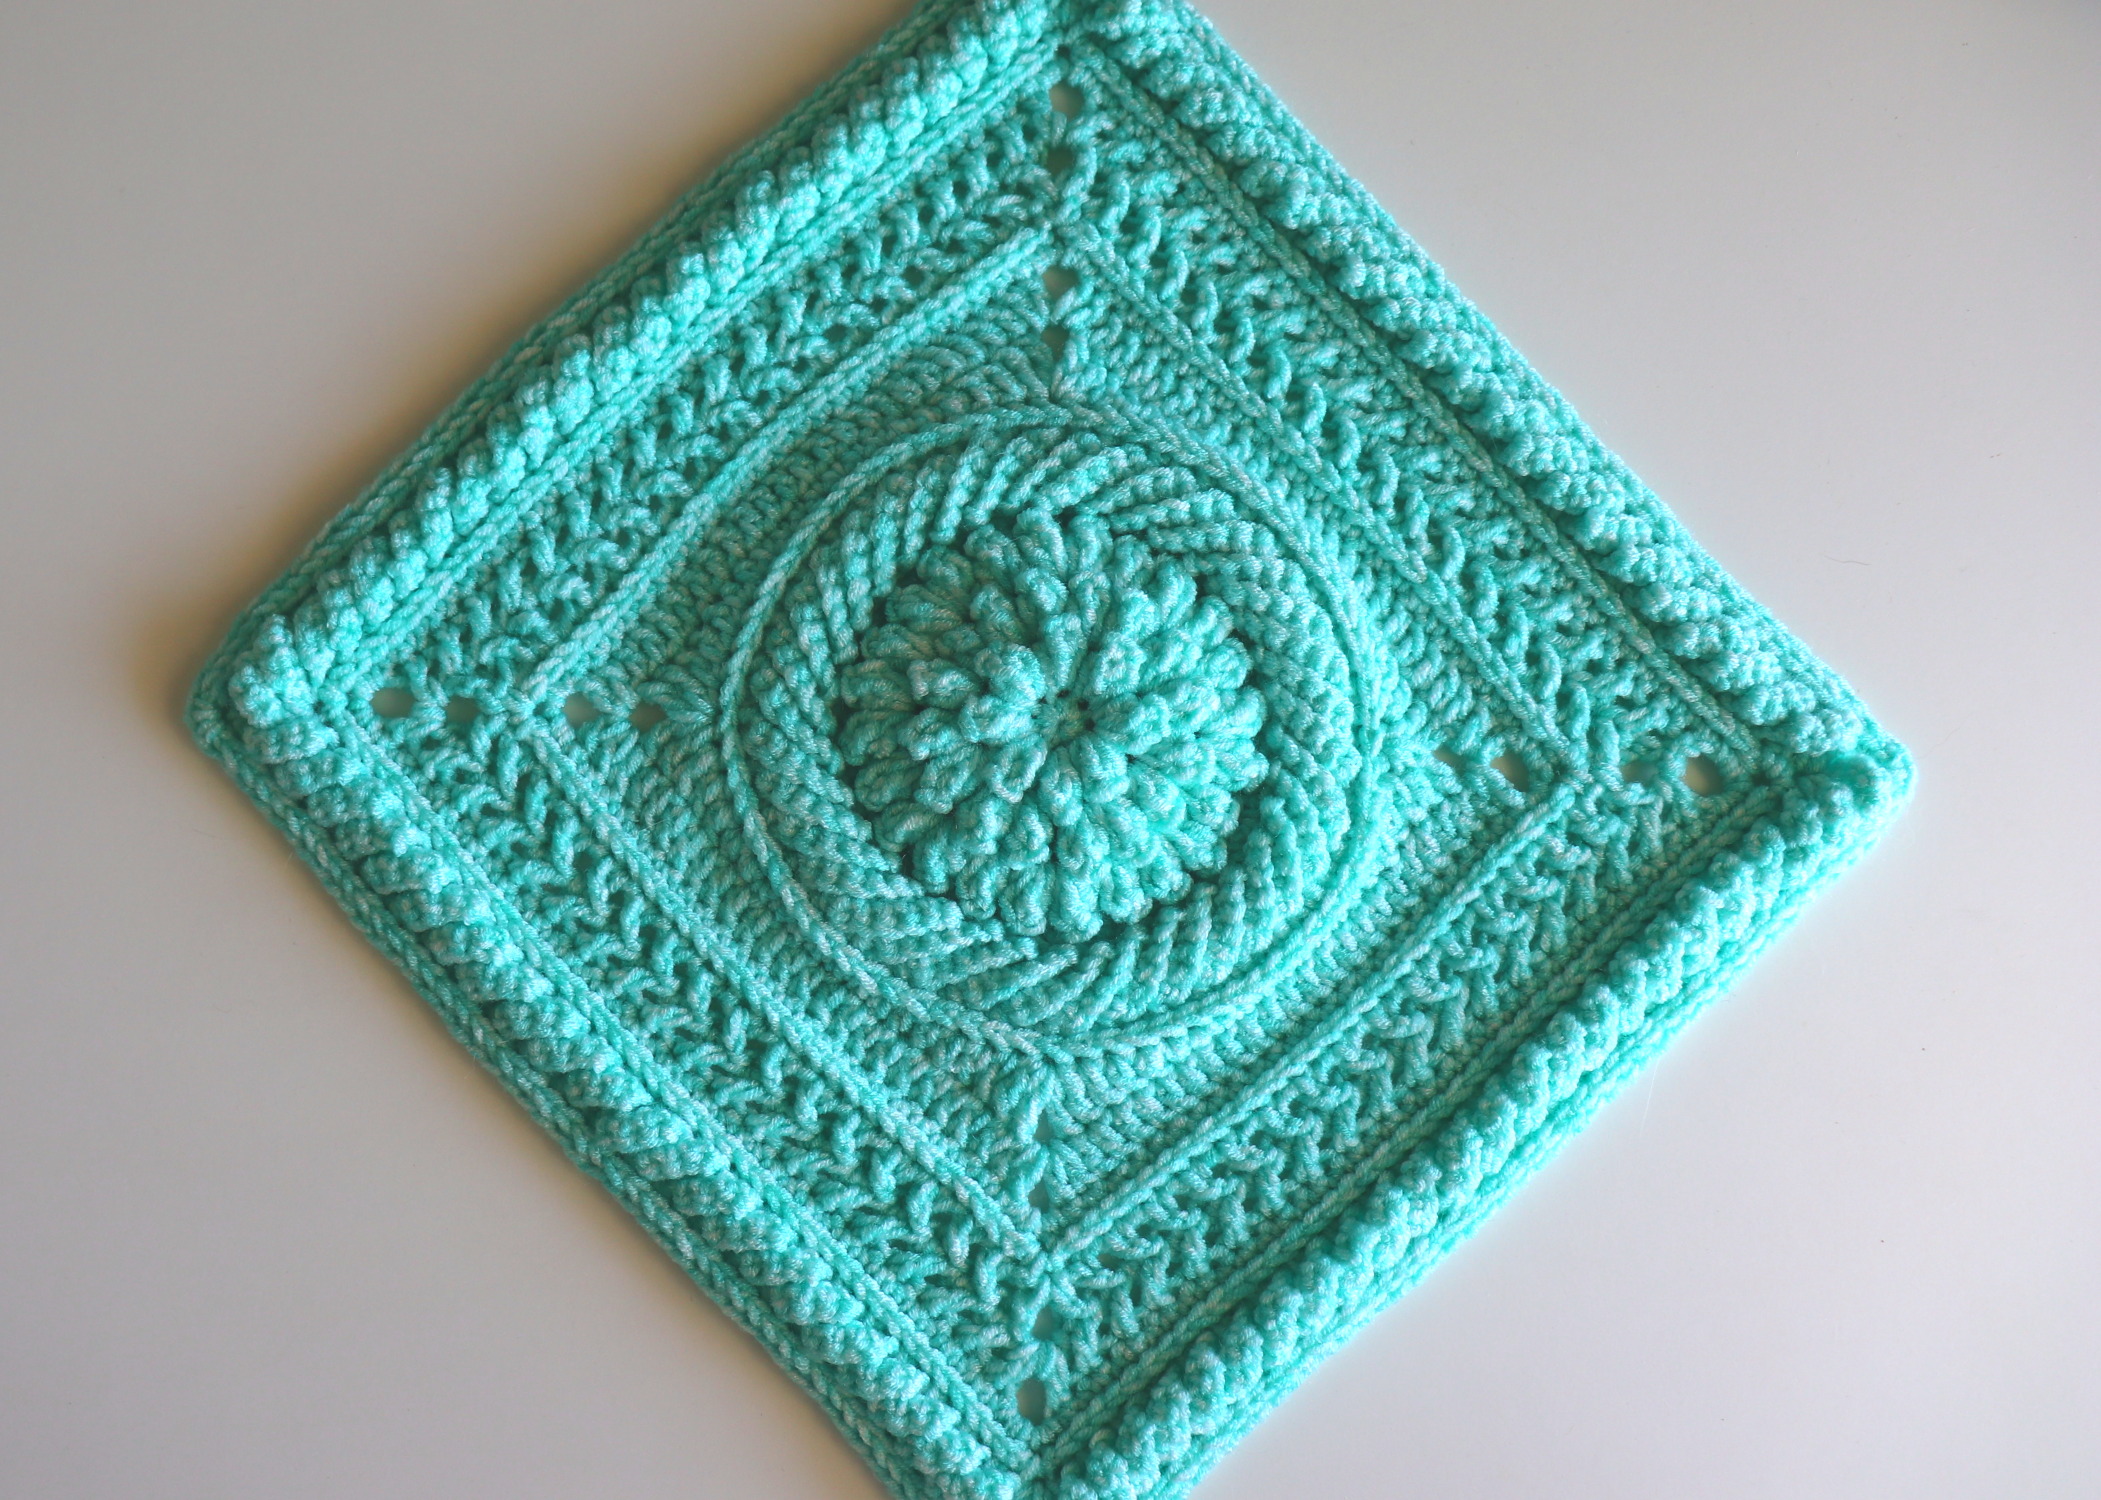 Crochet Cosmos Square